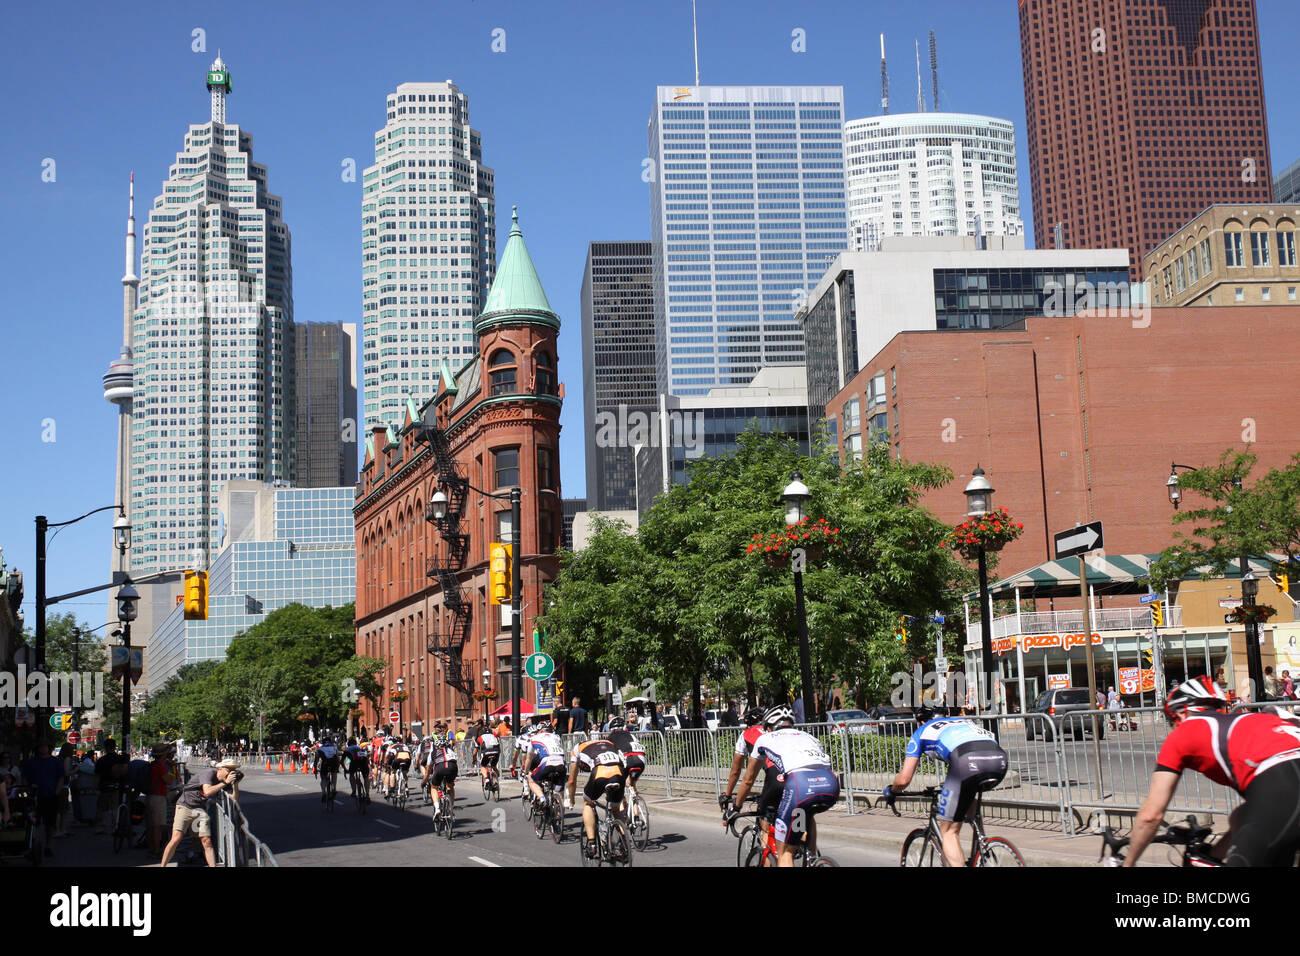 Toronto Criterium Bicycle Race, 2010 Stock Photo